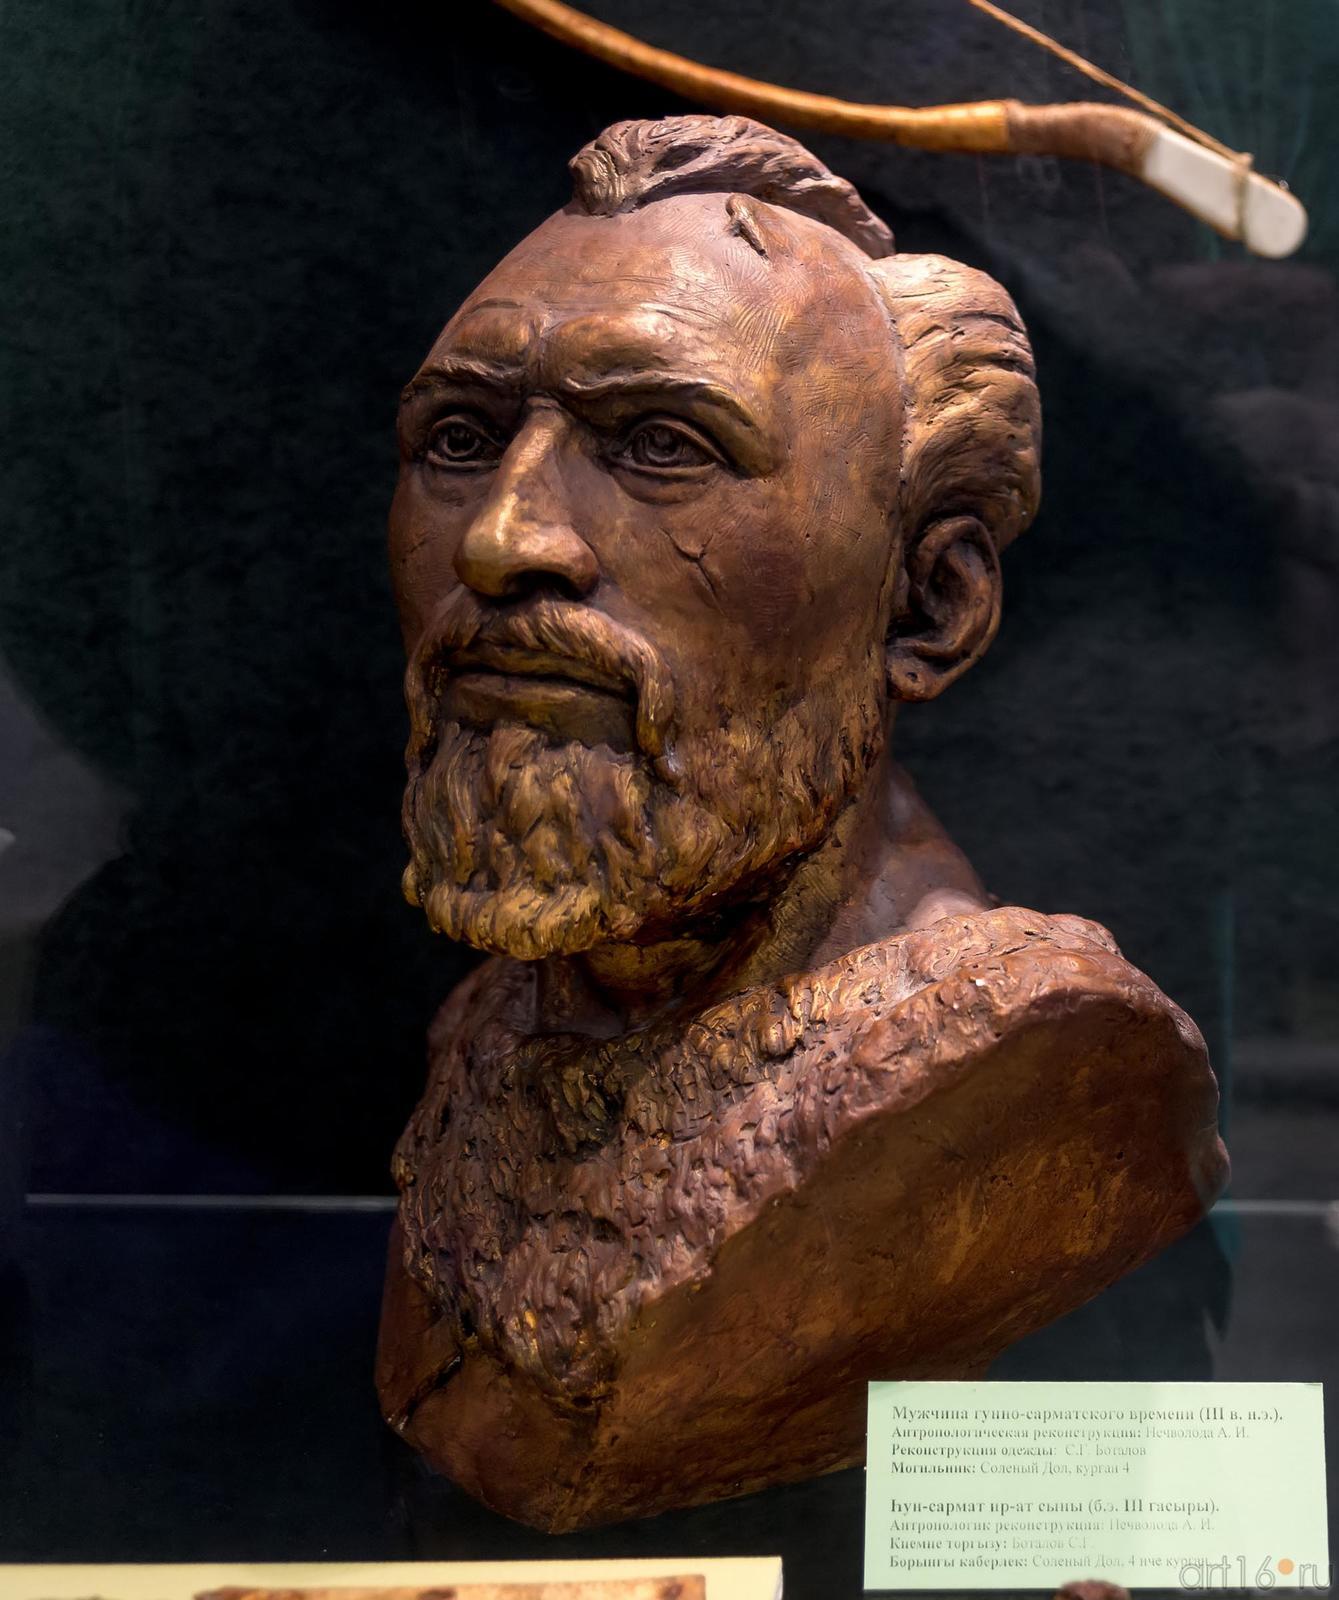 Фото №886447. Мужчина гунно-сарматского времени (III в. н.э.)